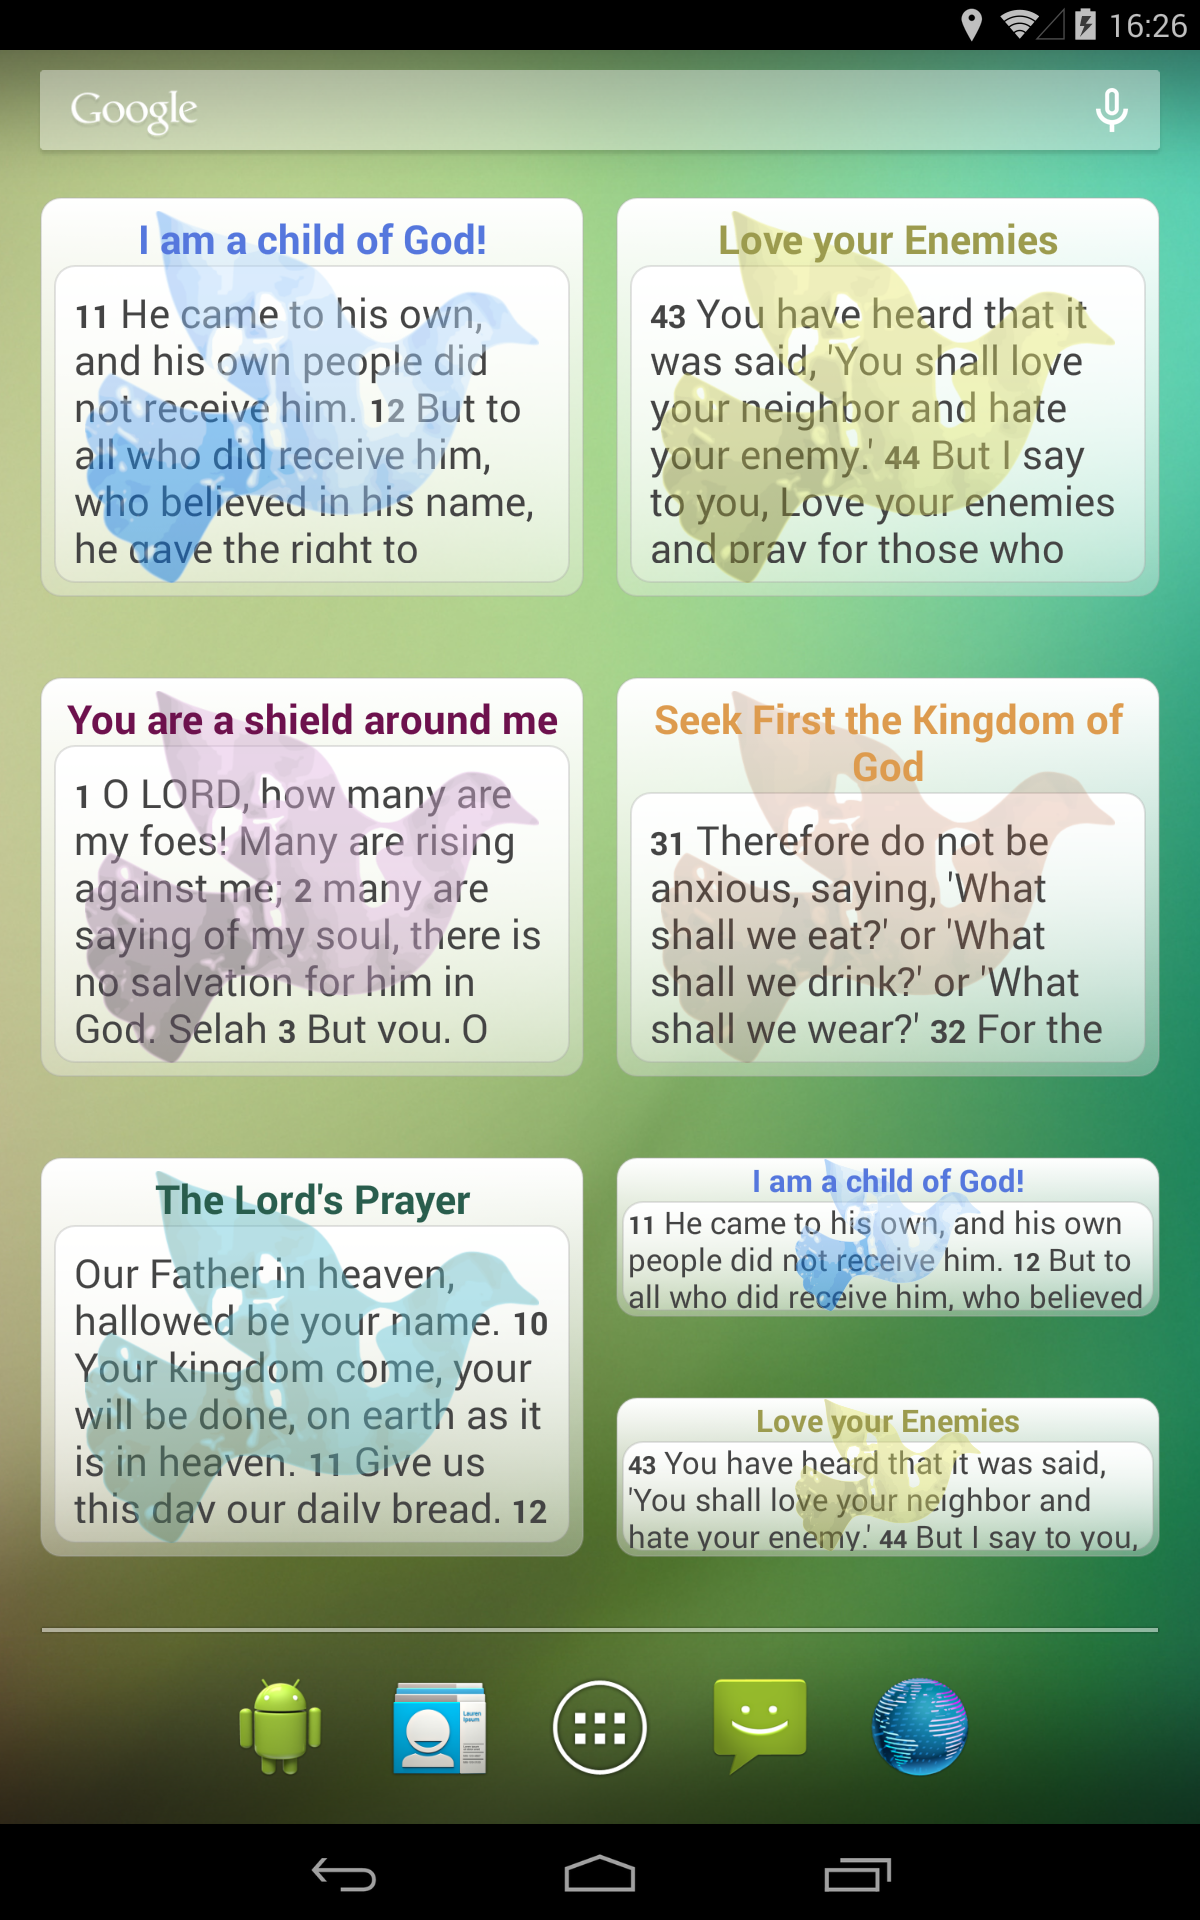 Prayers & Blessings Daily screenshot #16